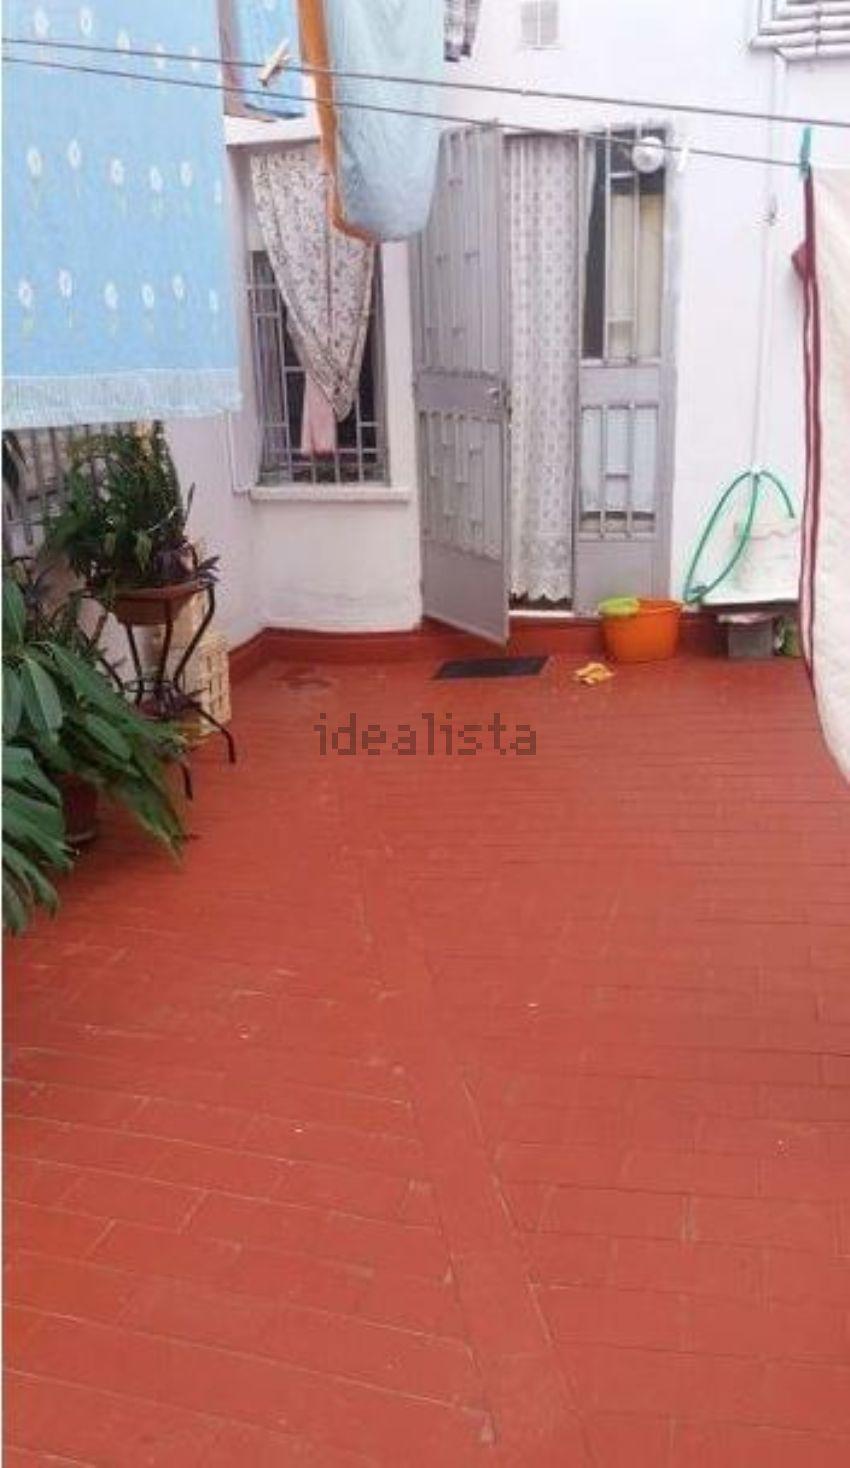 Piso en calle Salvador de Madariaga, 8, Huerta Rosales - Valdepasillas, Badajoz